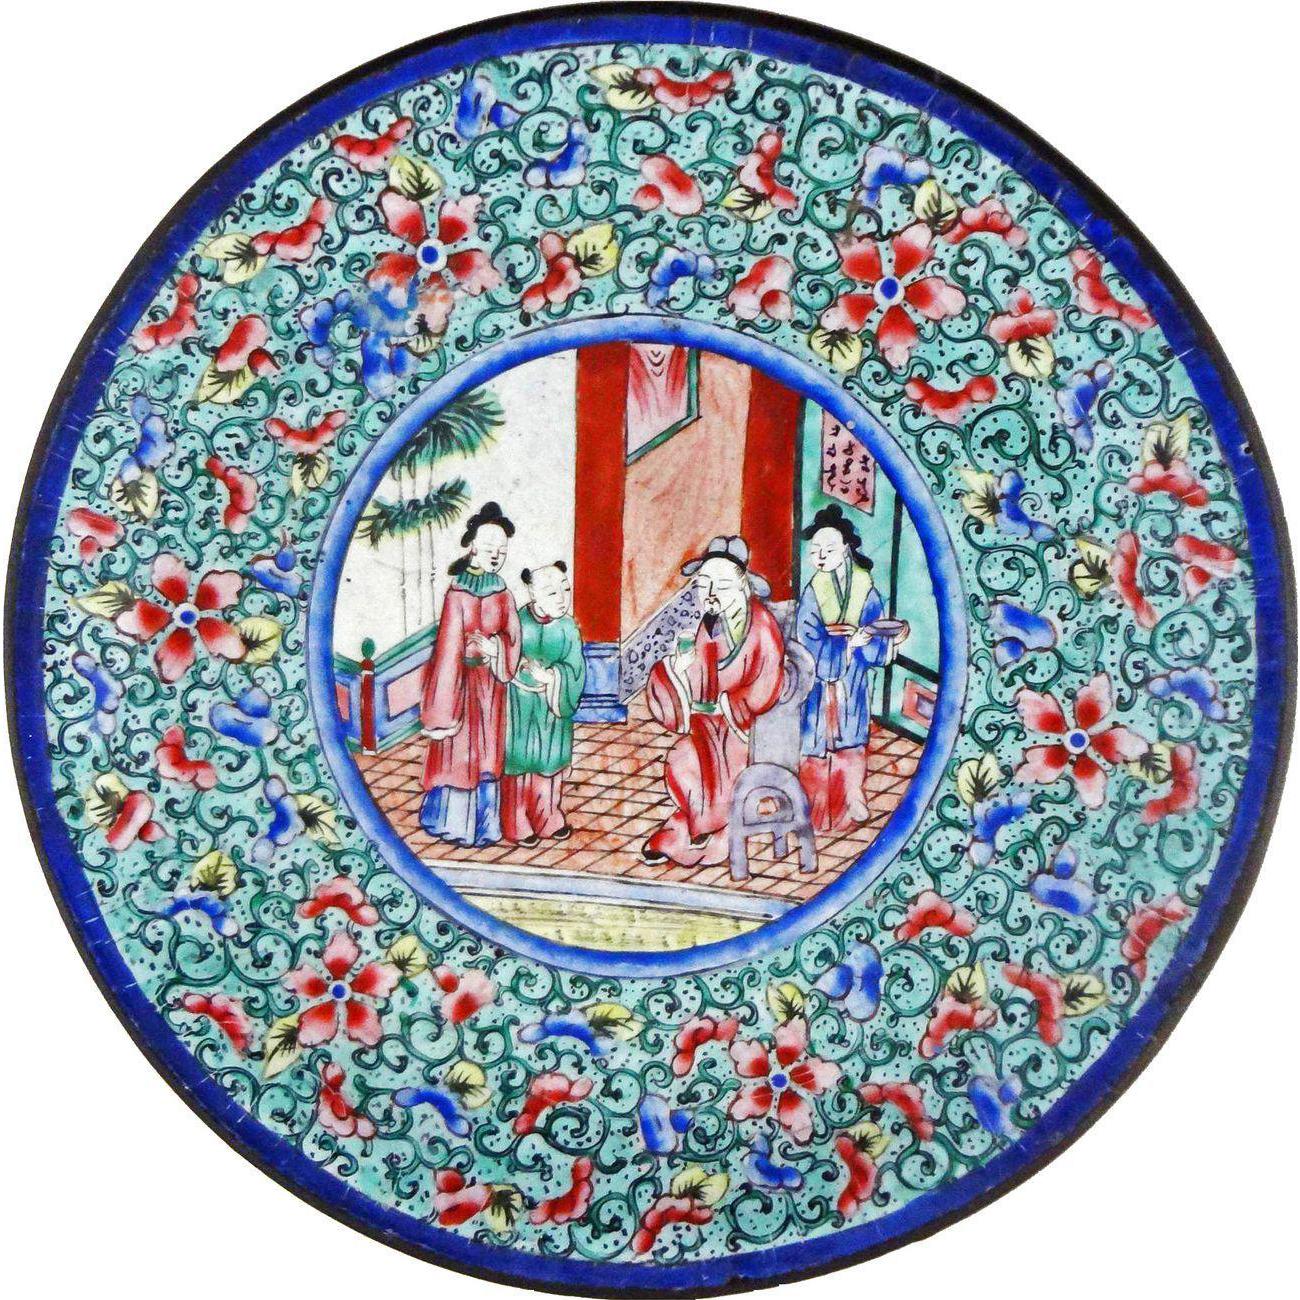 Antique Chinese Enamel Painting on Copper Rose Mandarin Dish